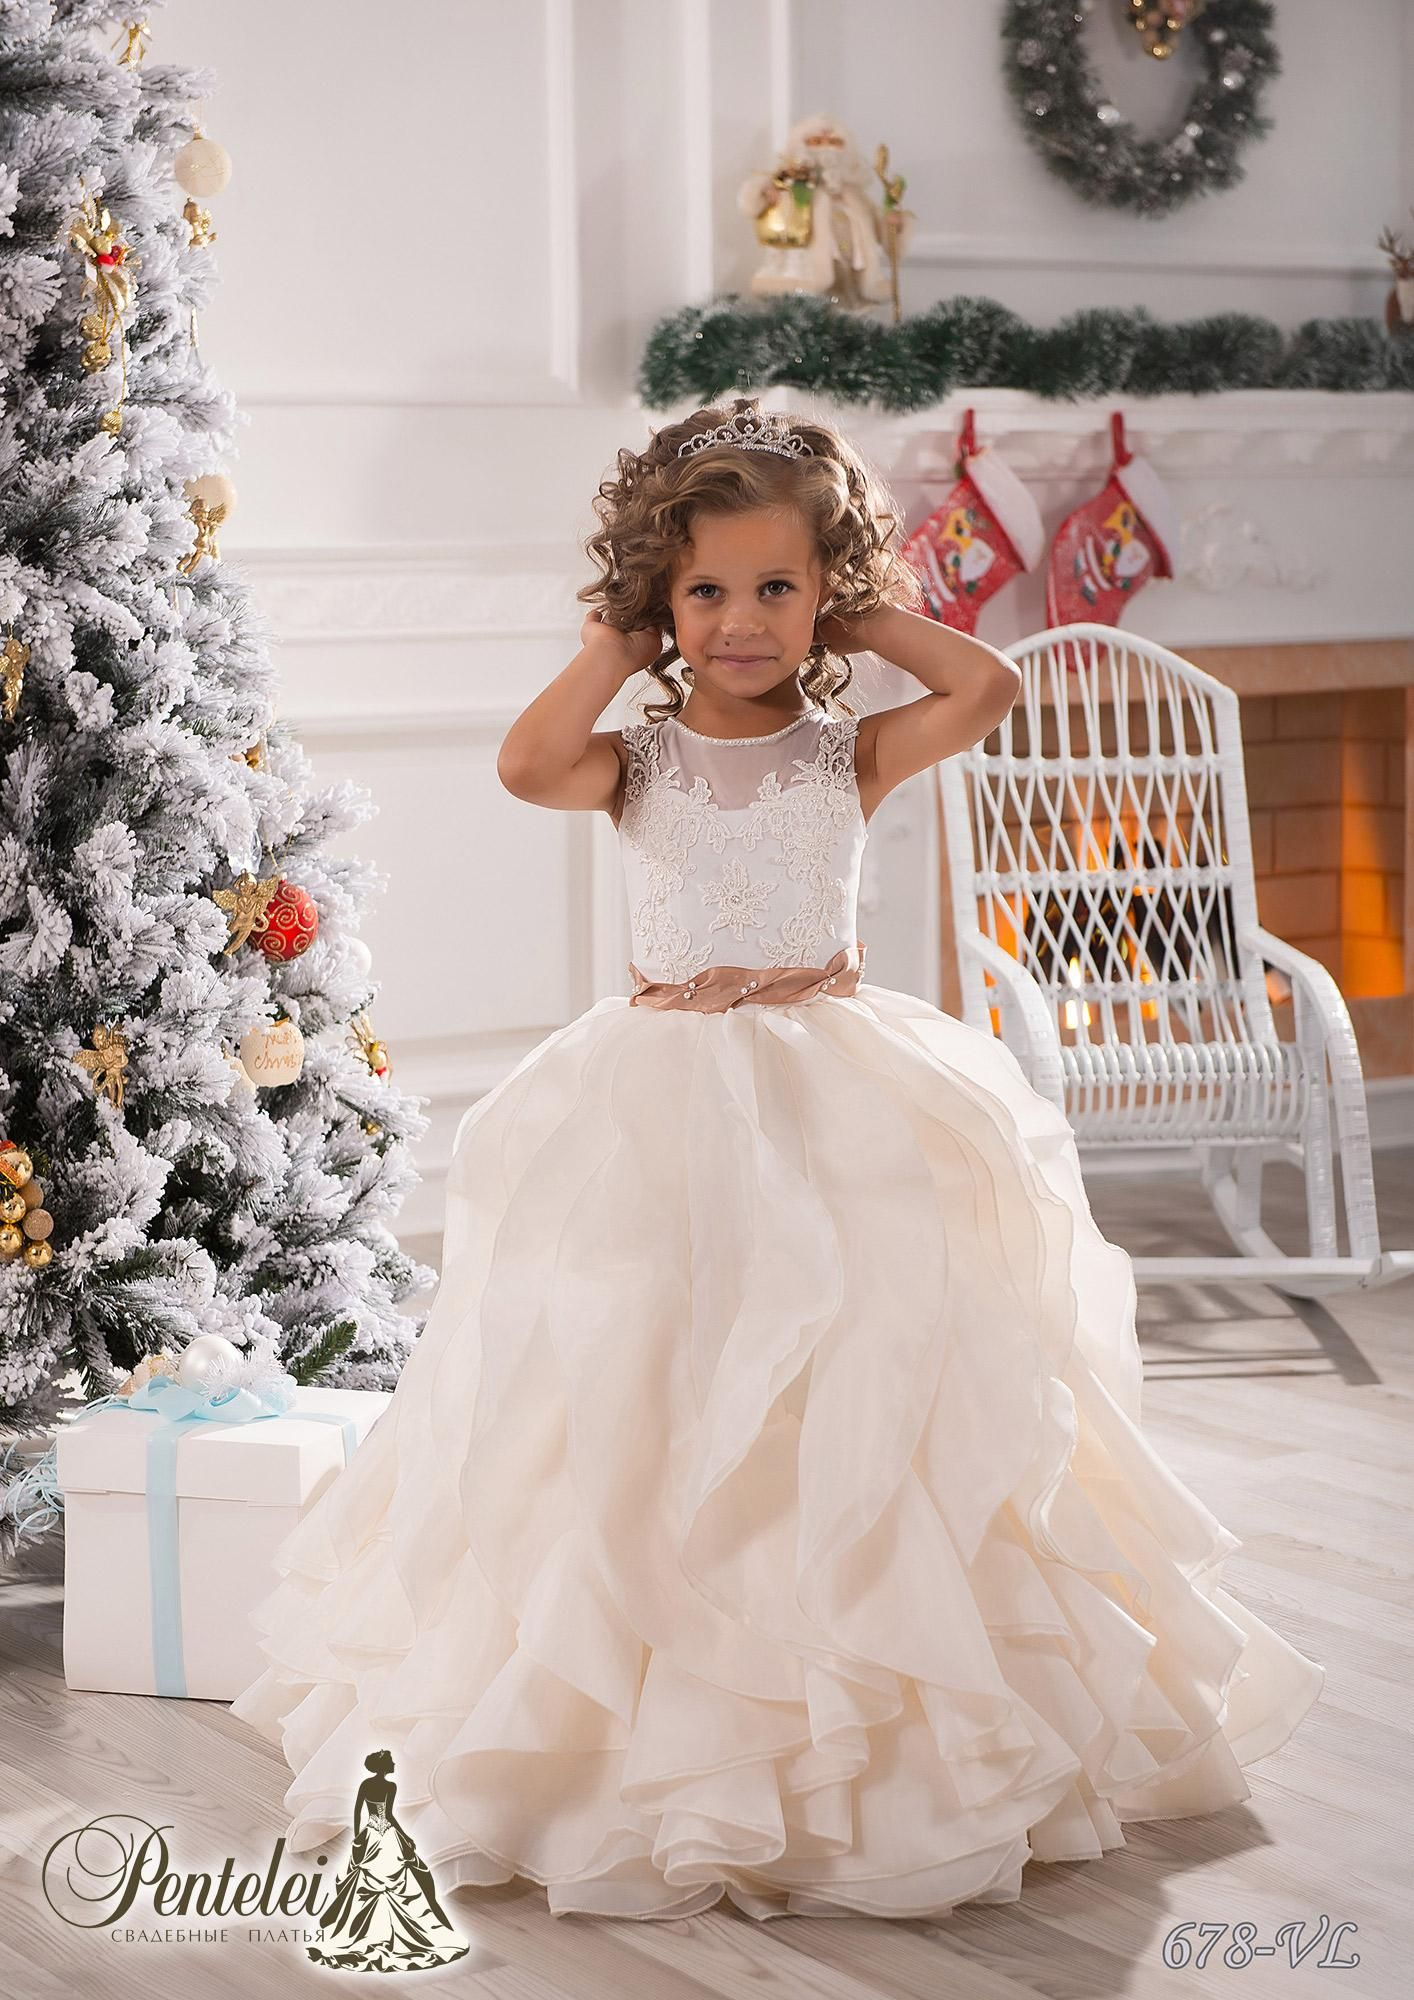 Anagrassia Flower Girl Dress for Fall Winter Wedding